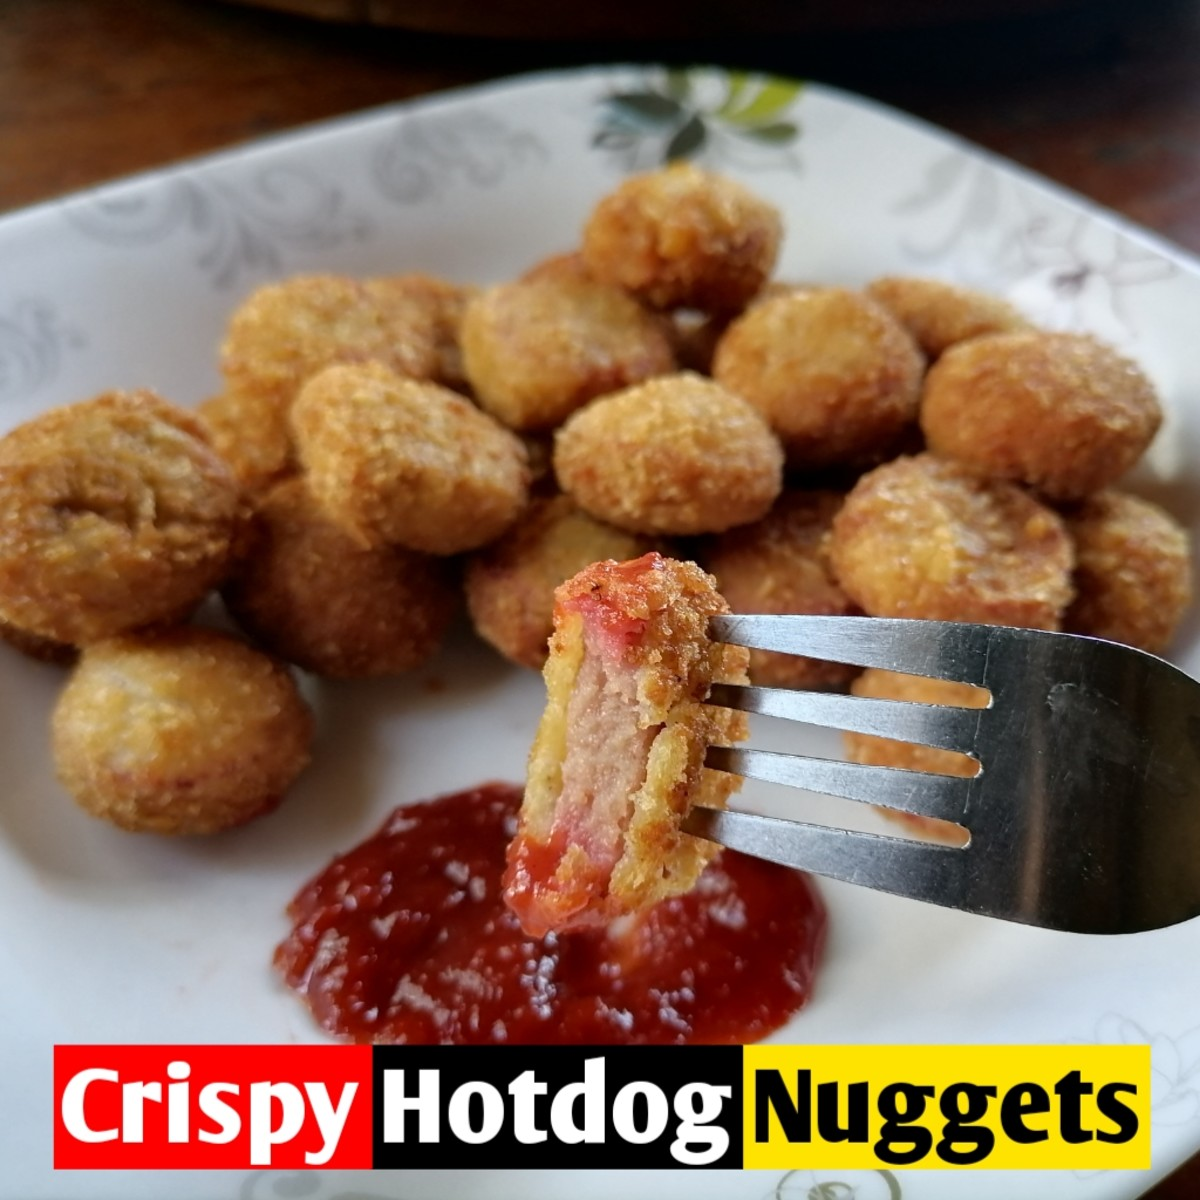 crispy-hotdog-nuggets